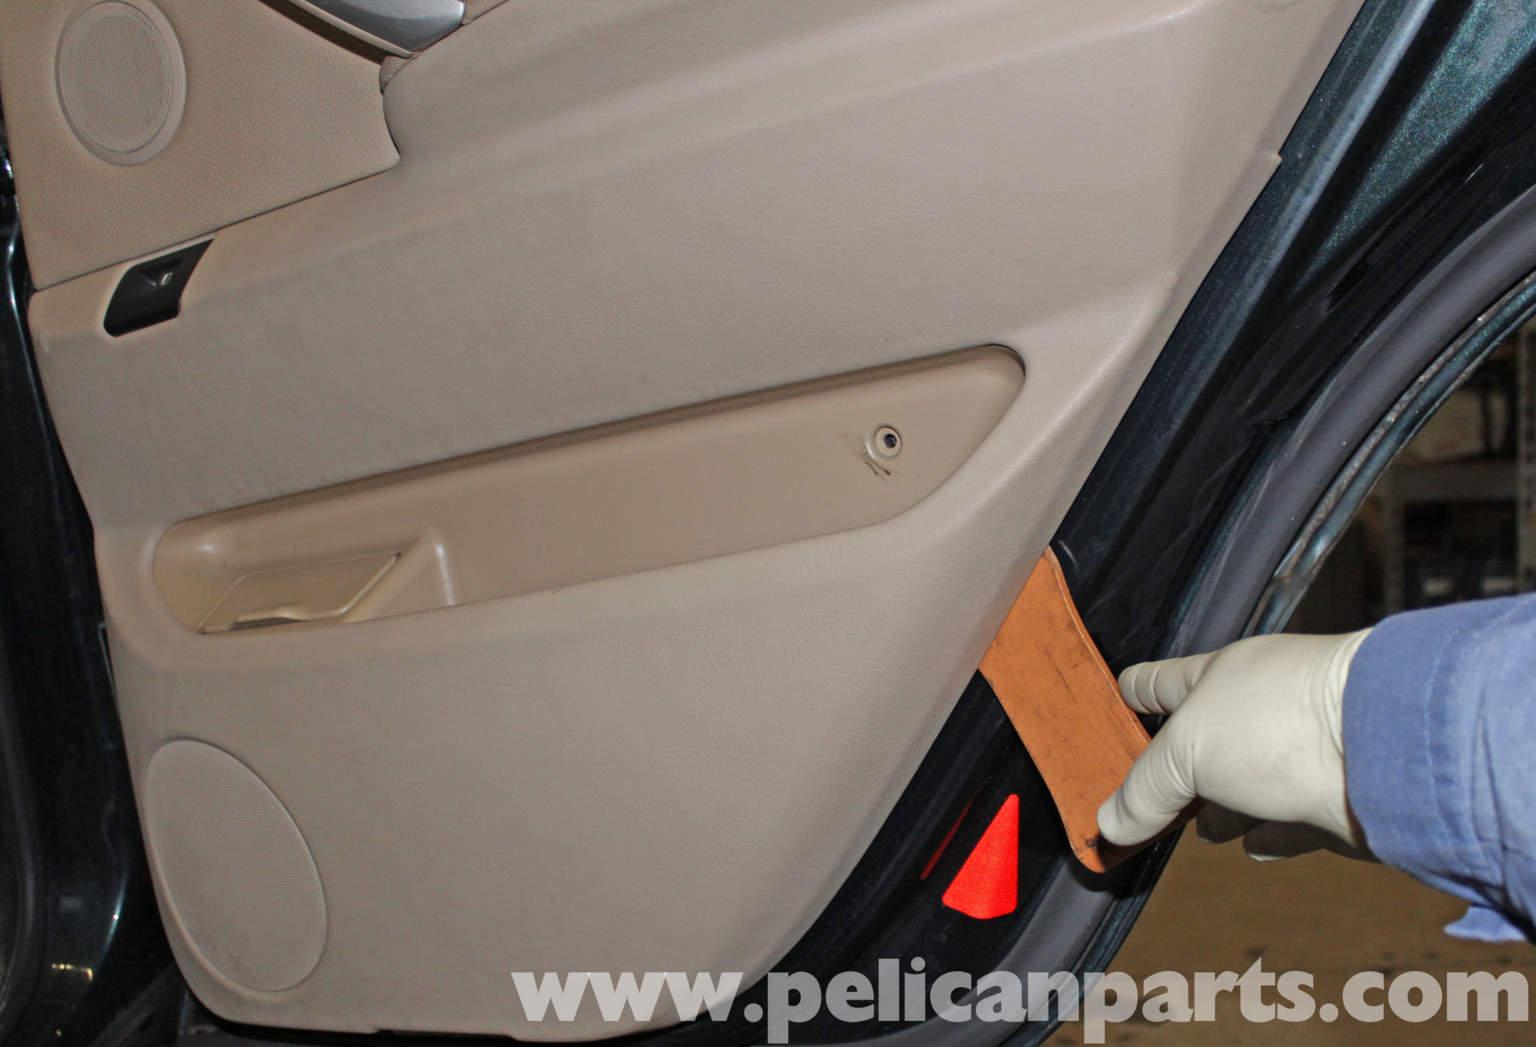 pelican technical article bmw x5 rear door panel replacement. Black Bedroom Furniture Sets. Home Design Ideas